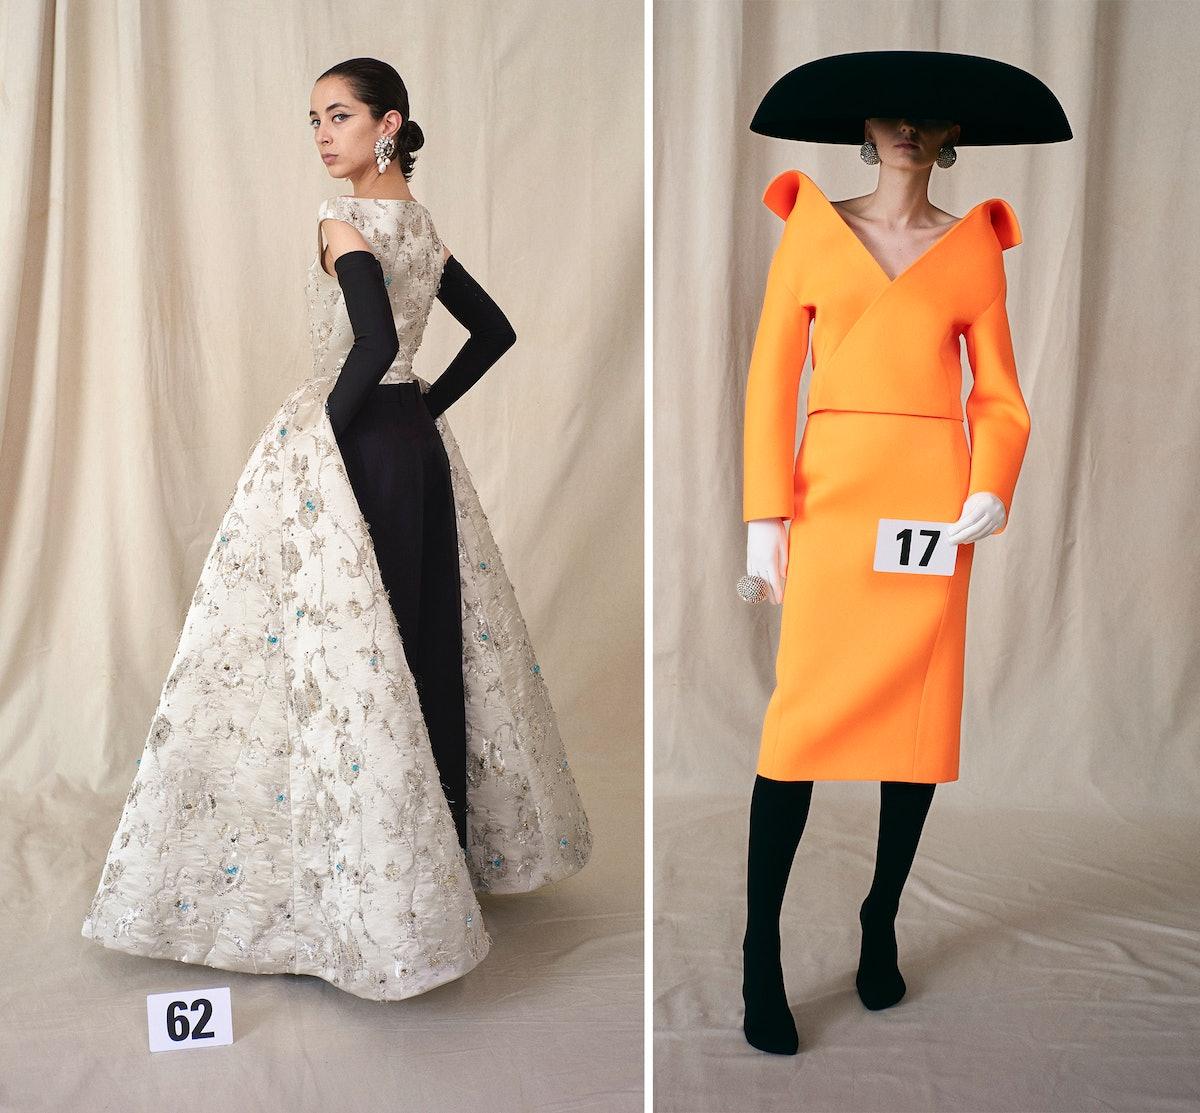 Two Balenciaga couture looks